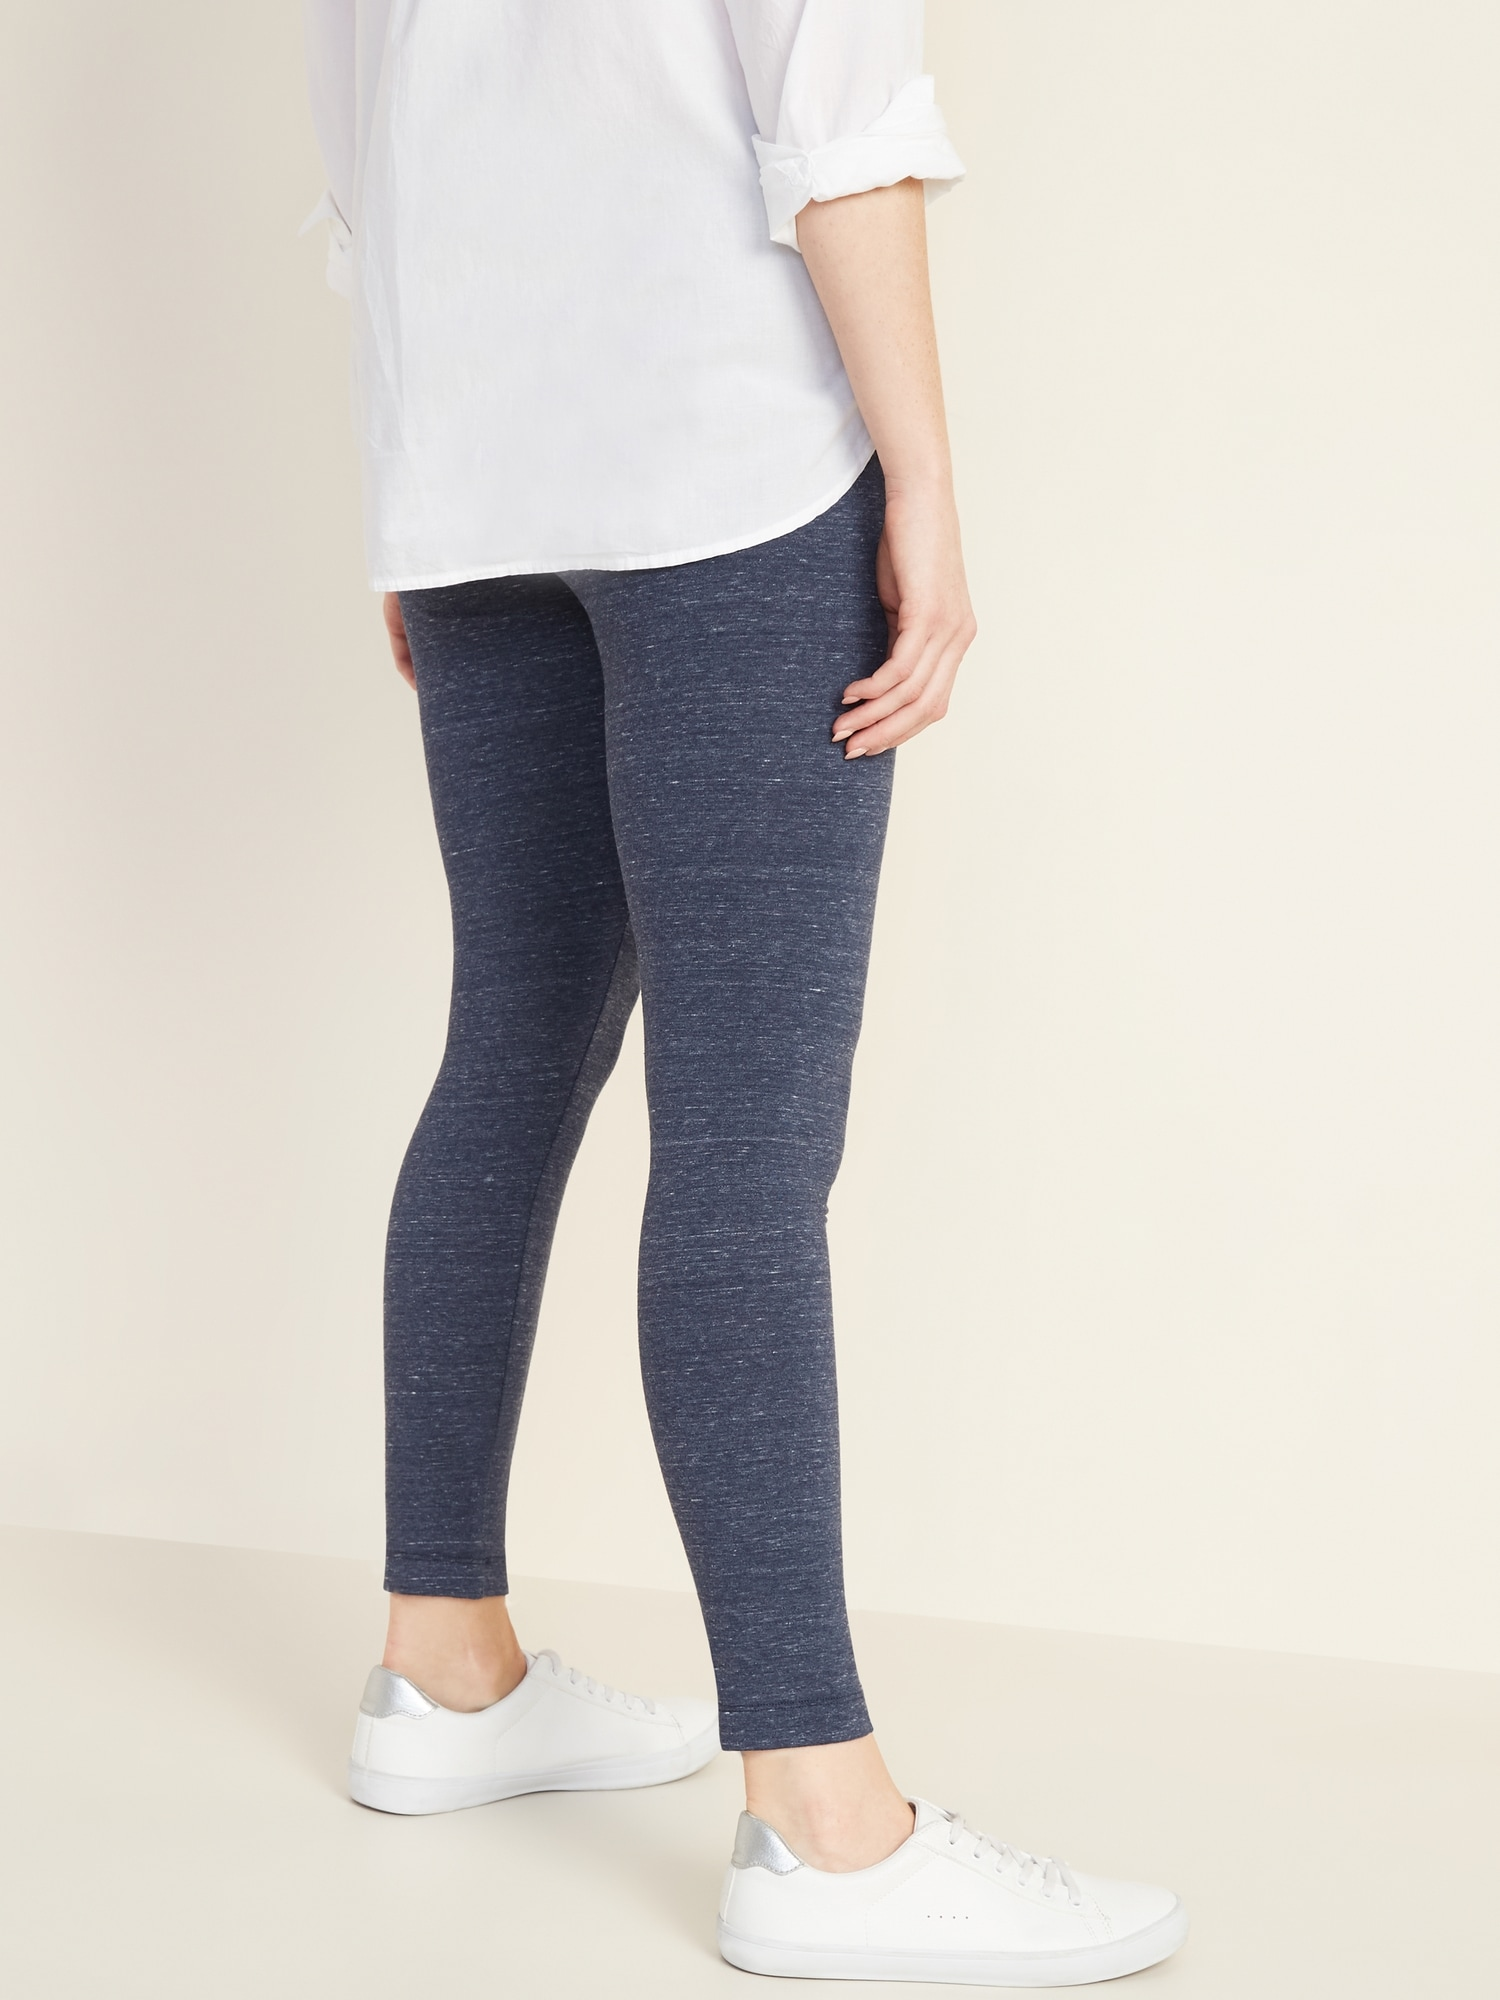 80b712a06d62d0 Mid-Rise Space-Dye Leggings for Women   Old Navy